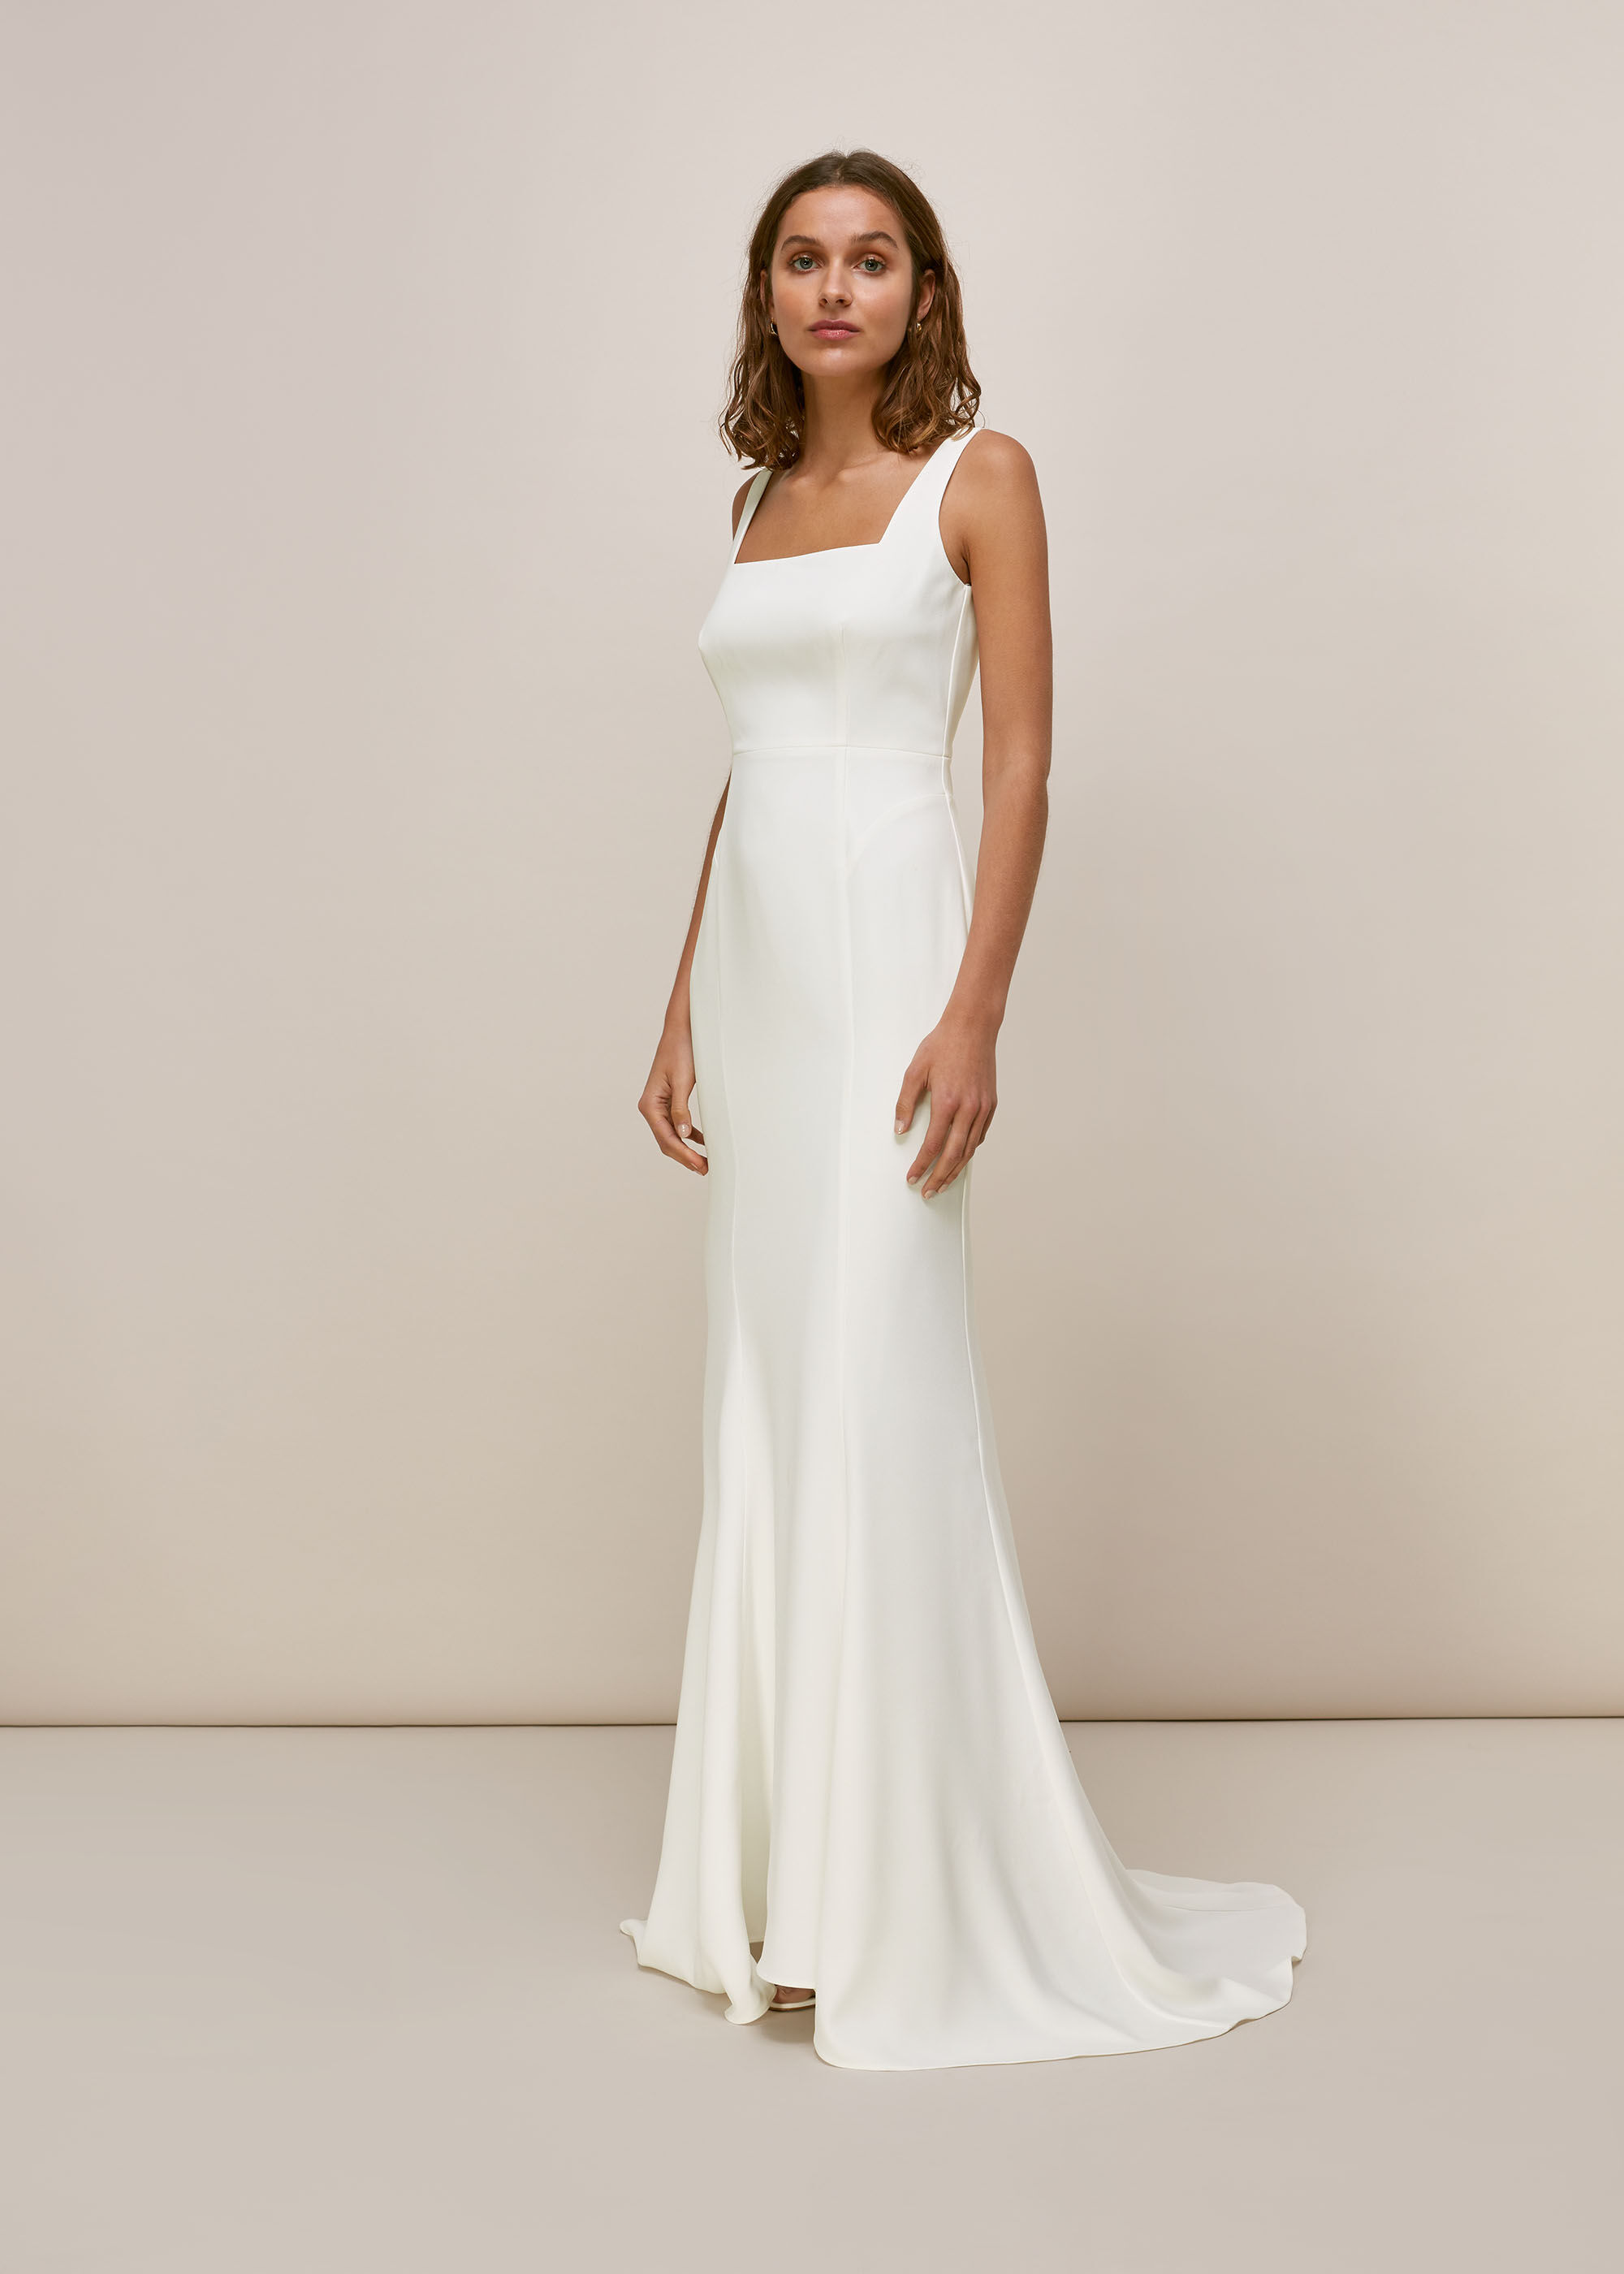 Ivory Mia Square Neck Wedding Dress